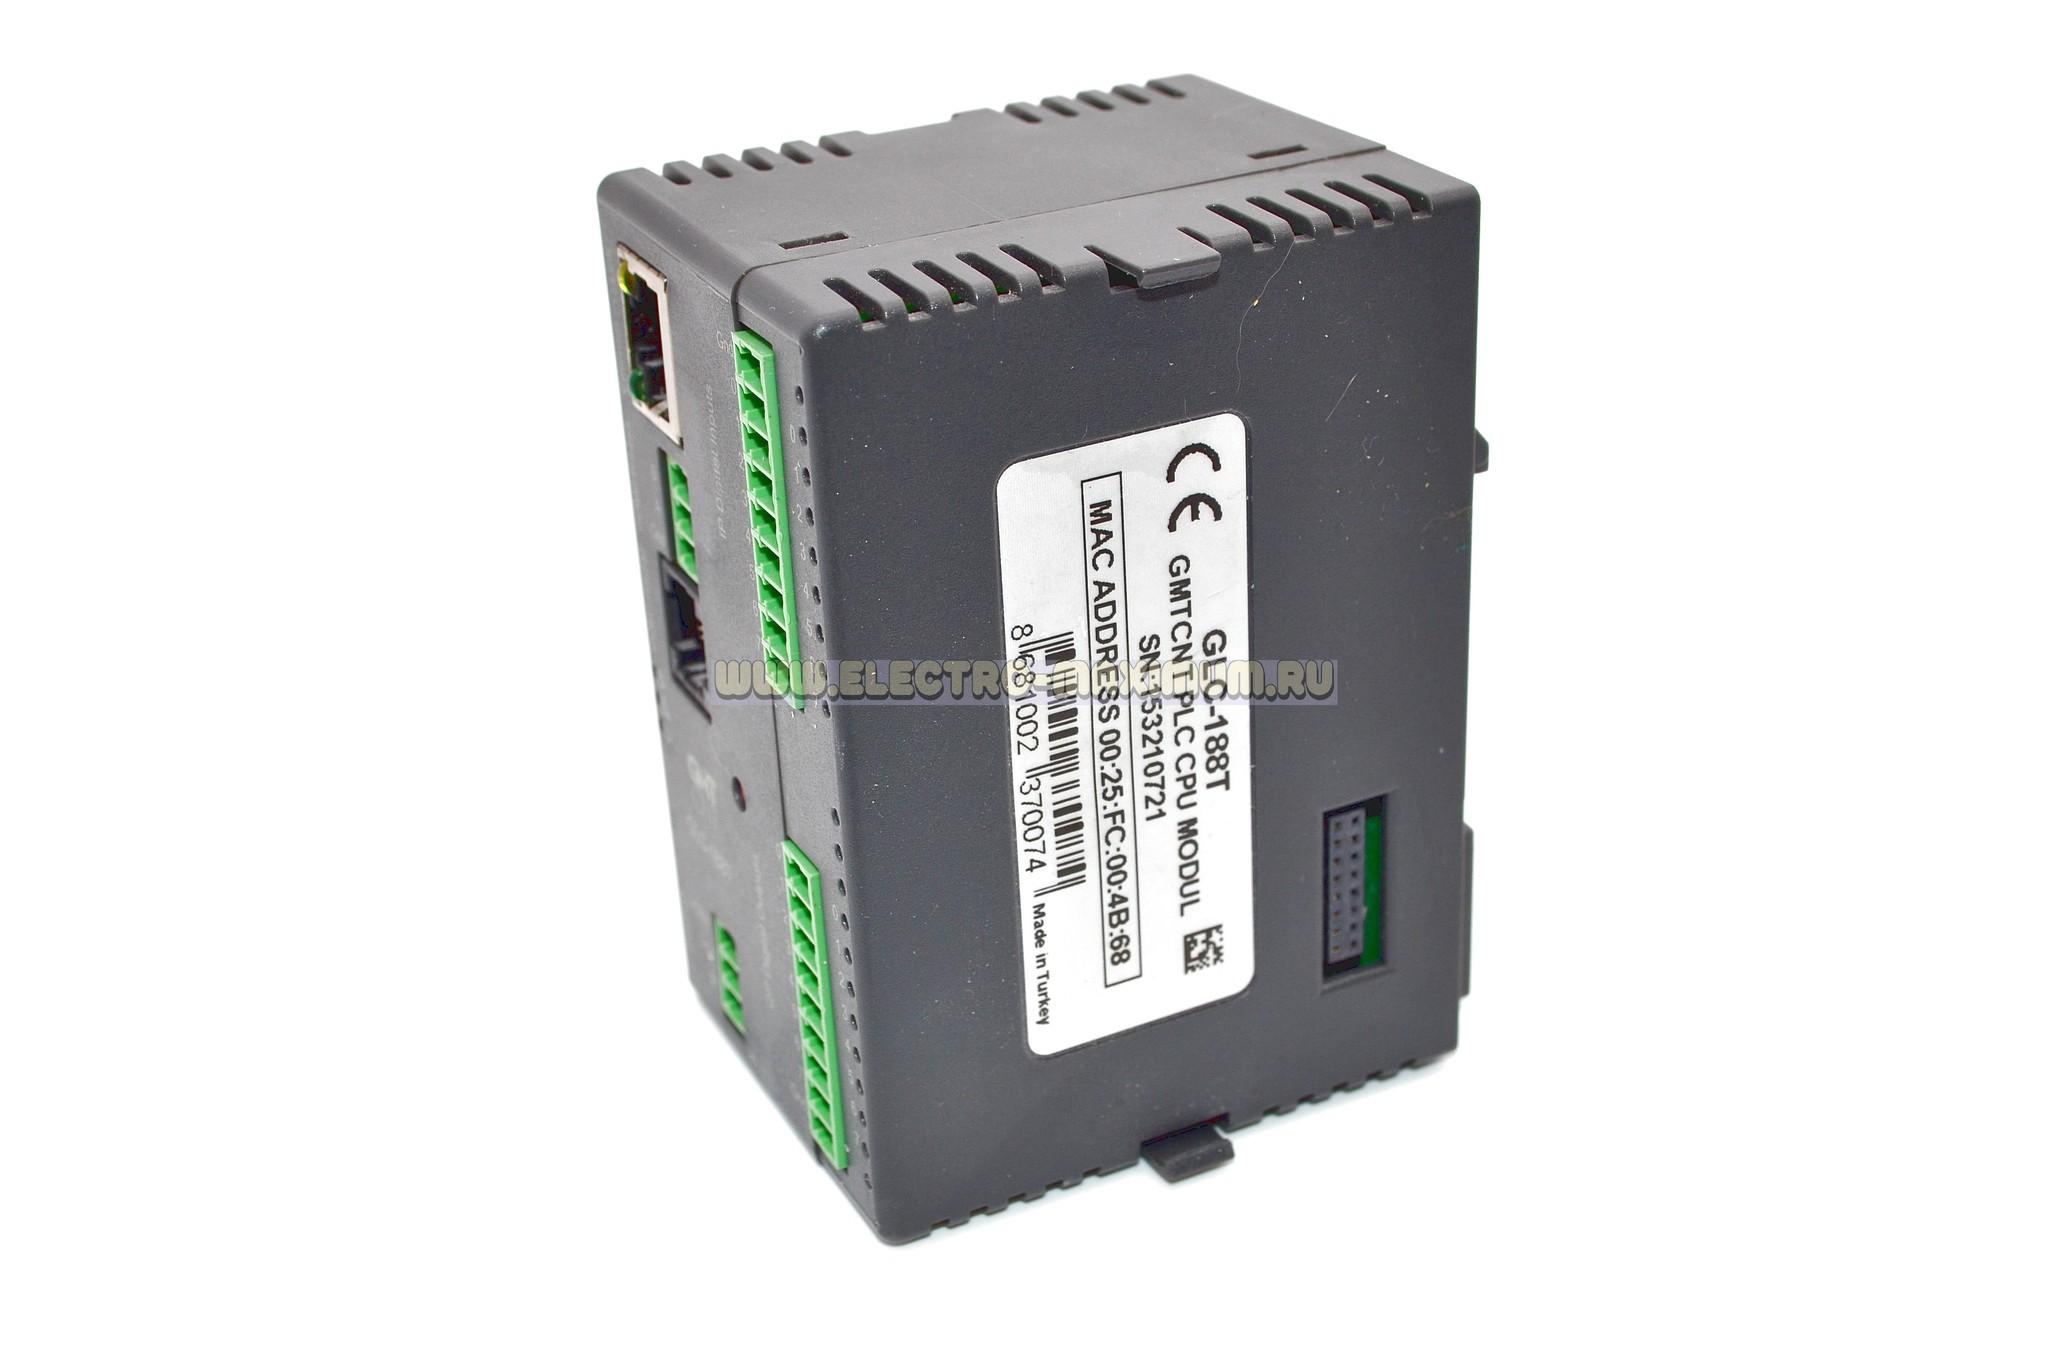 GLC-188T промышленный контроллер